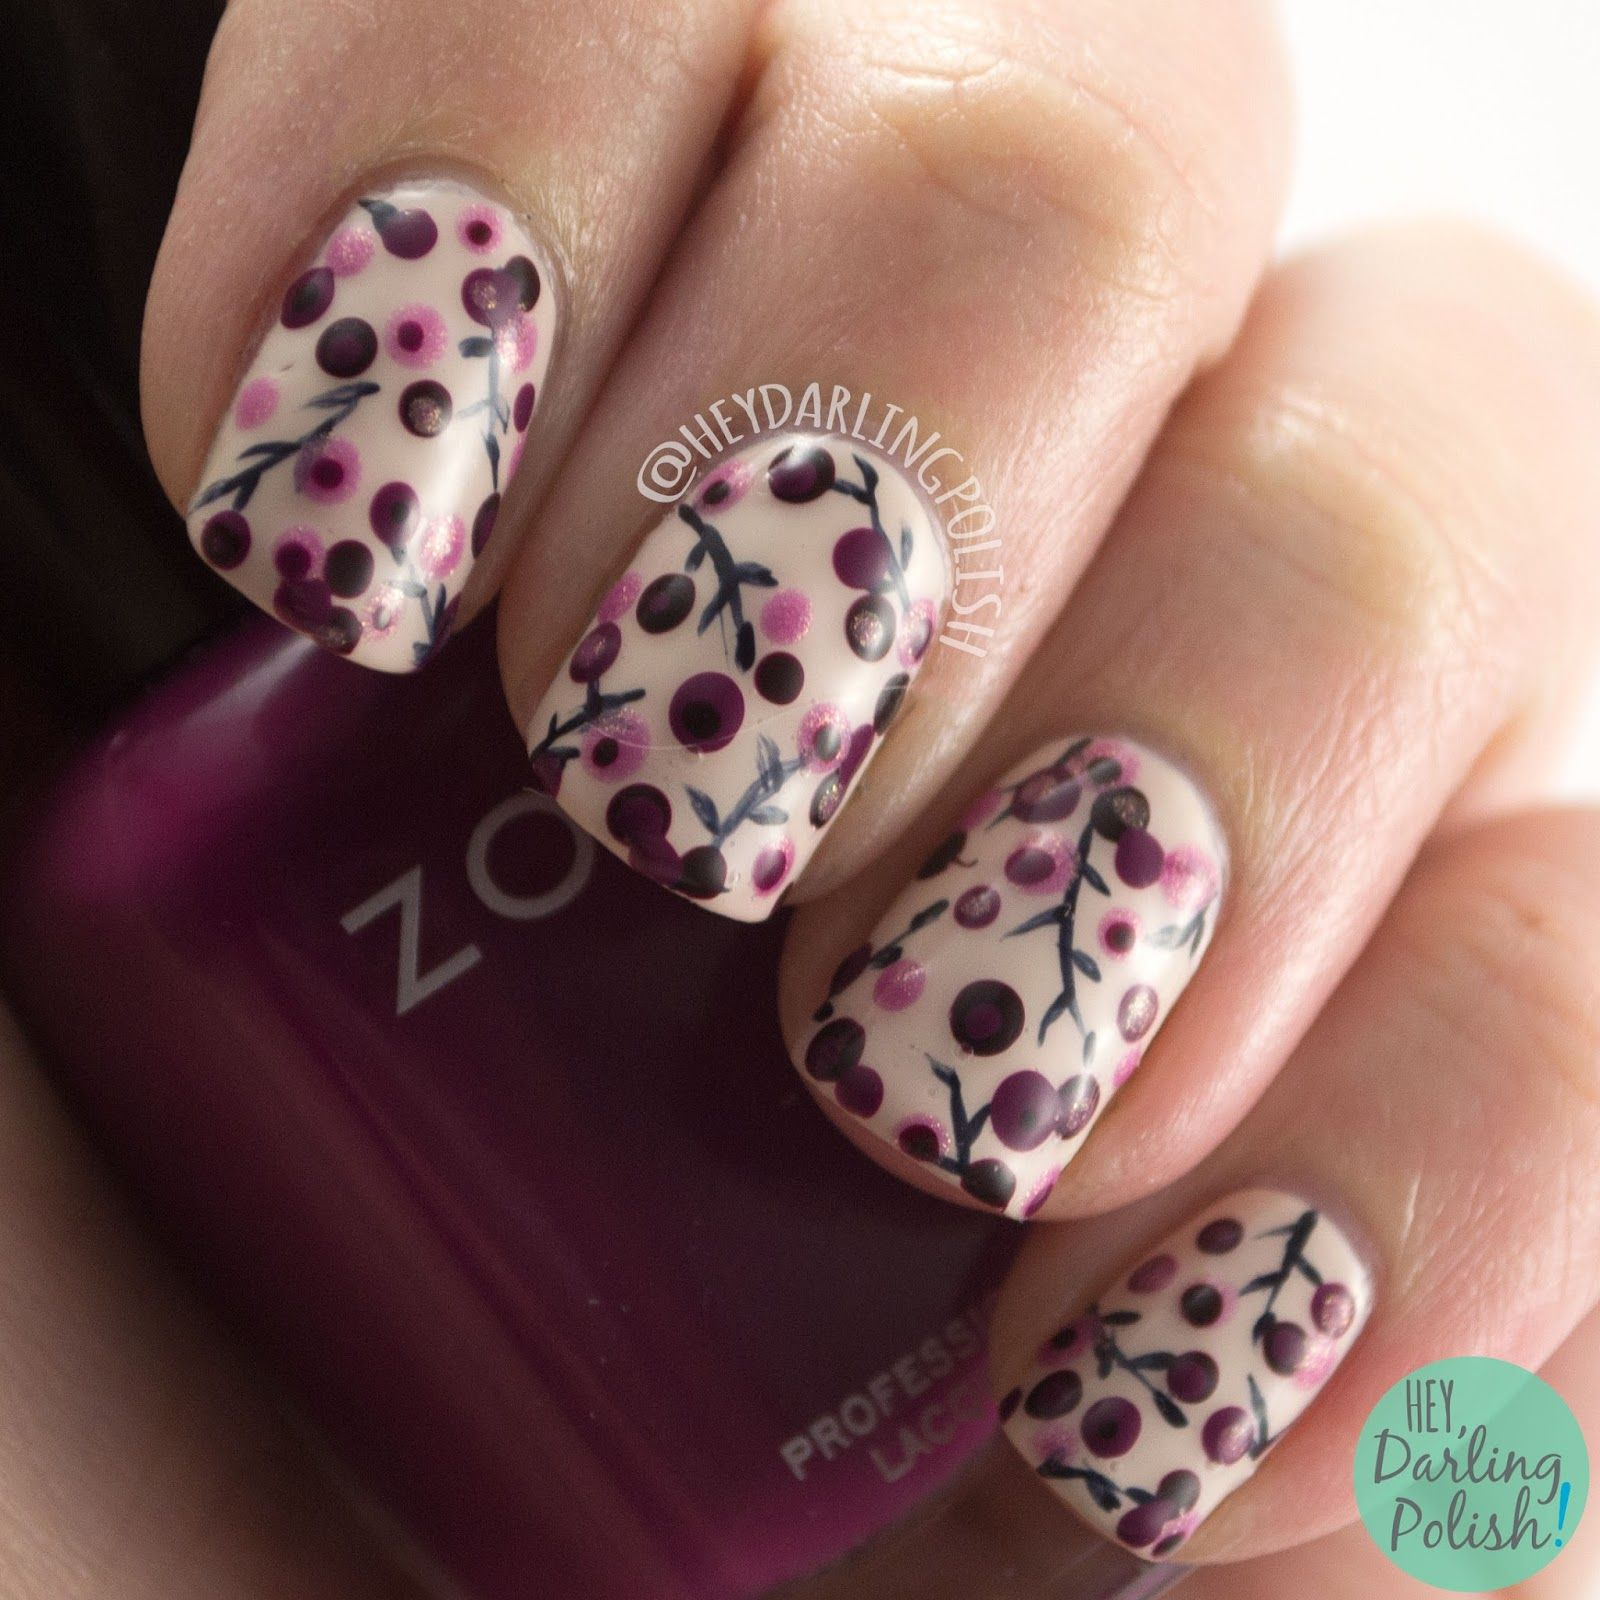 Hey Darling Polish 31 Day Challenge 2015 Dotting Tools Nails B